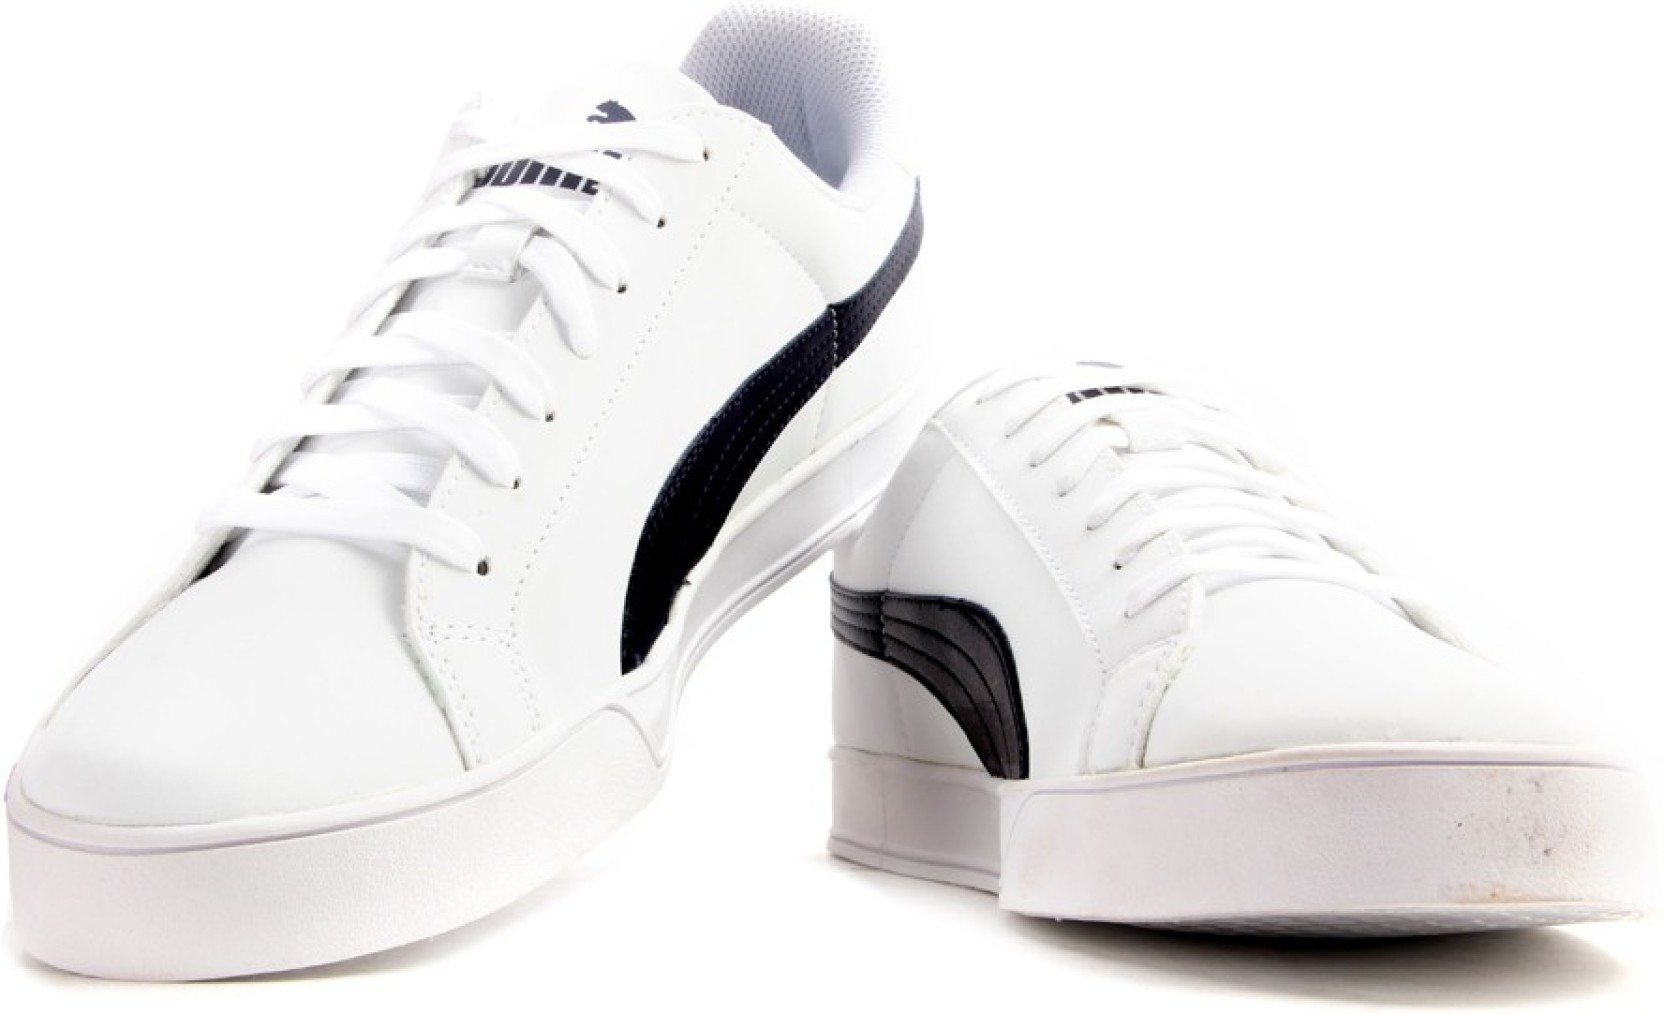 d1225f2bff Puma Smash Vulc Sneakers For Men